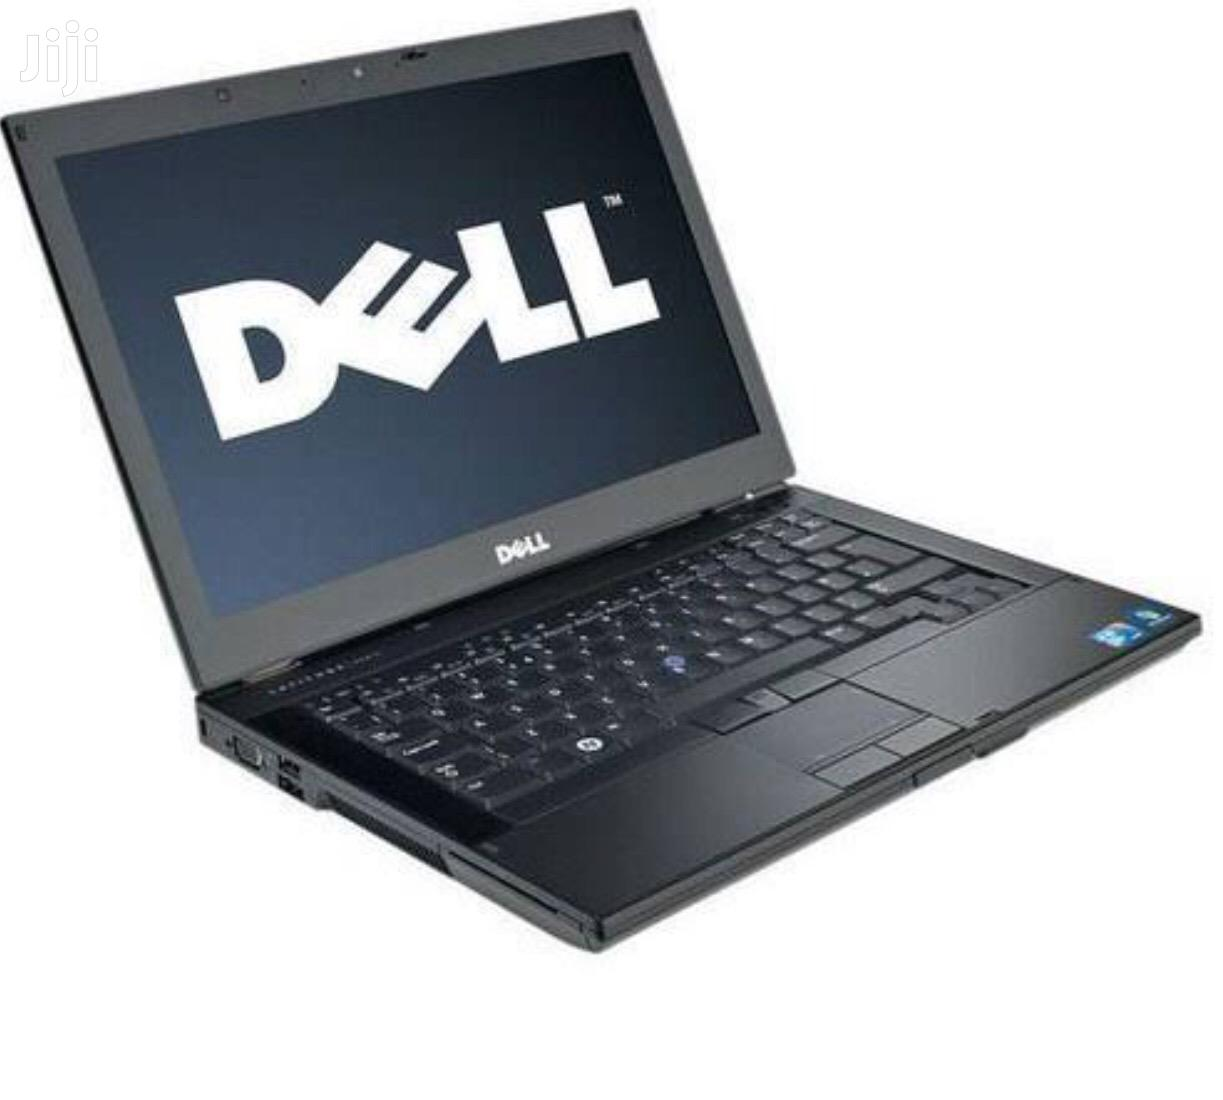 Laptop Dell Latitude E4310 4GB Intel Core I3 HDD 320GB | Laptops & Computers for sale in Kahawa, Nairobi, Kenya